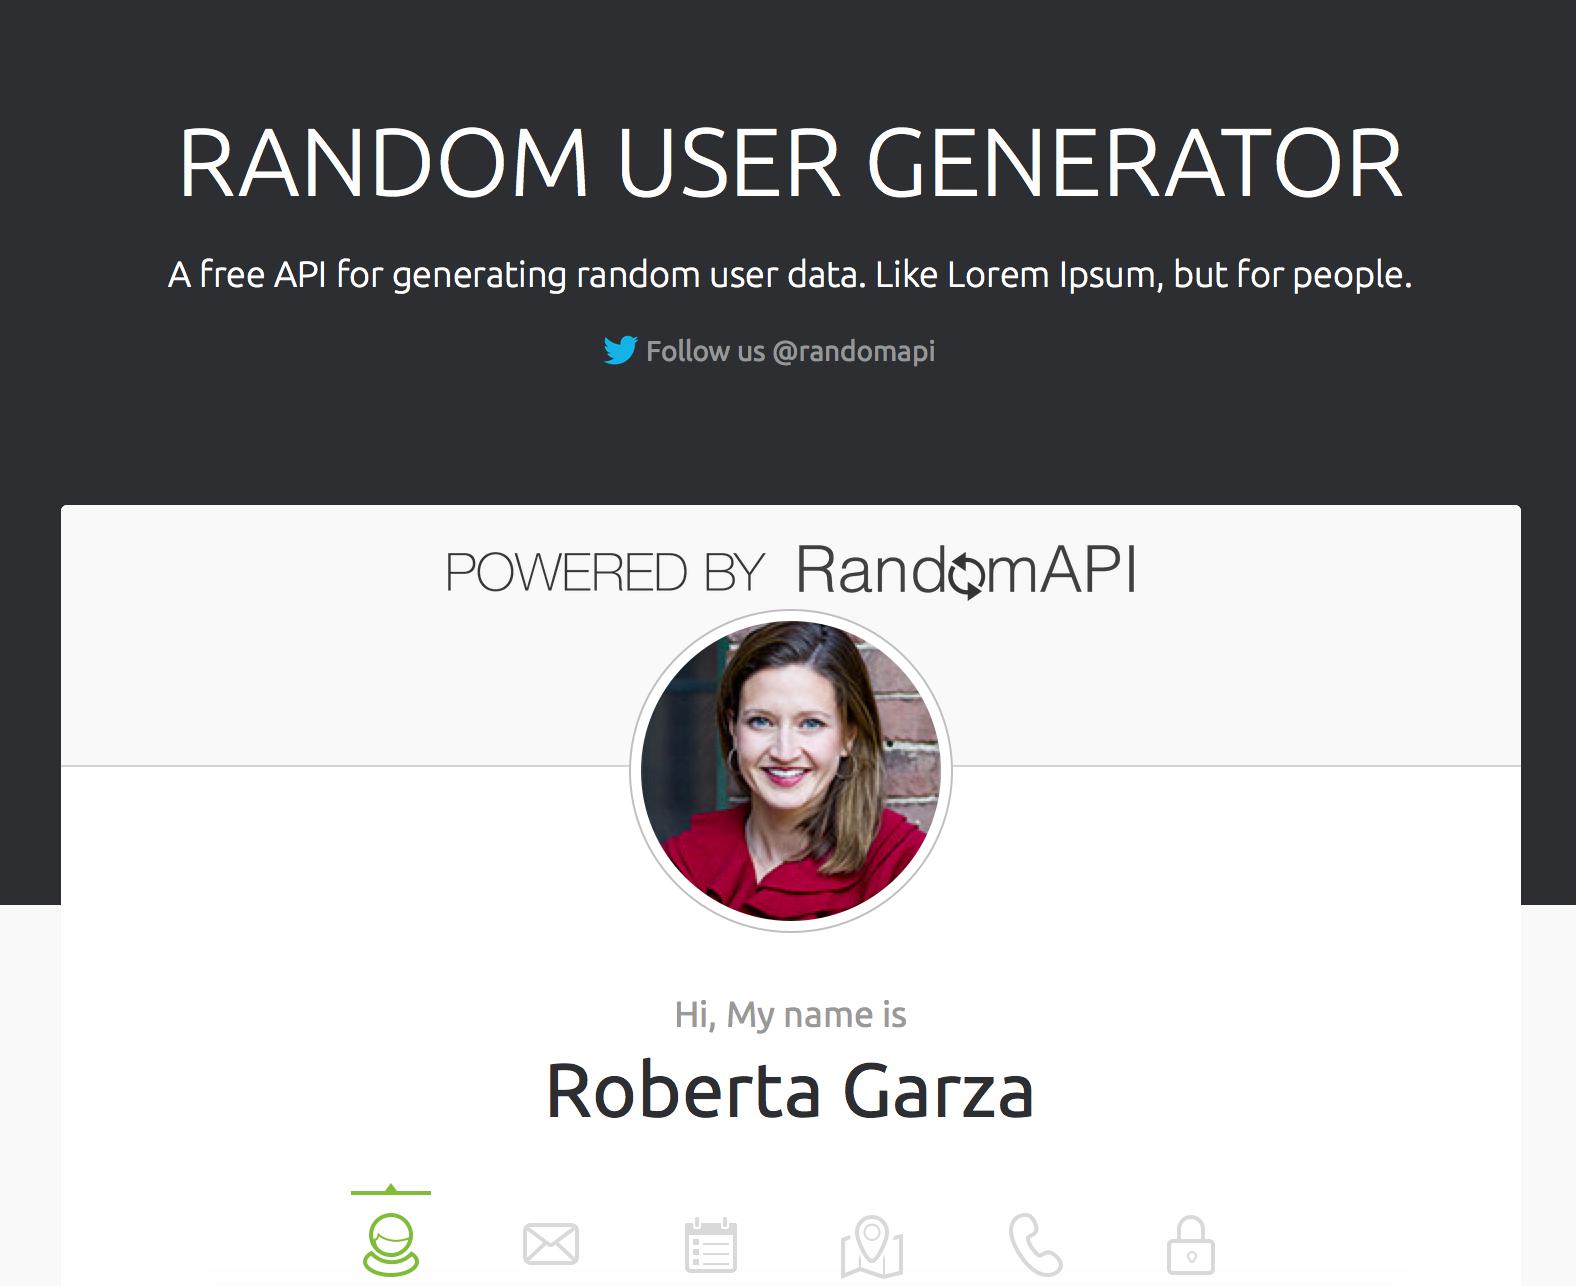 The Random User Generator